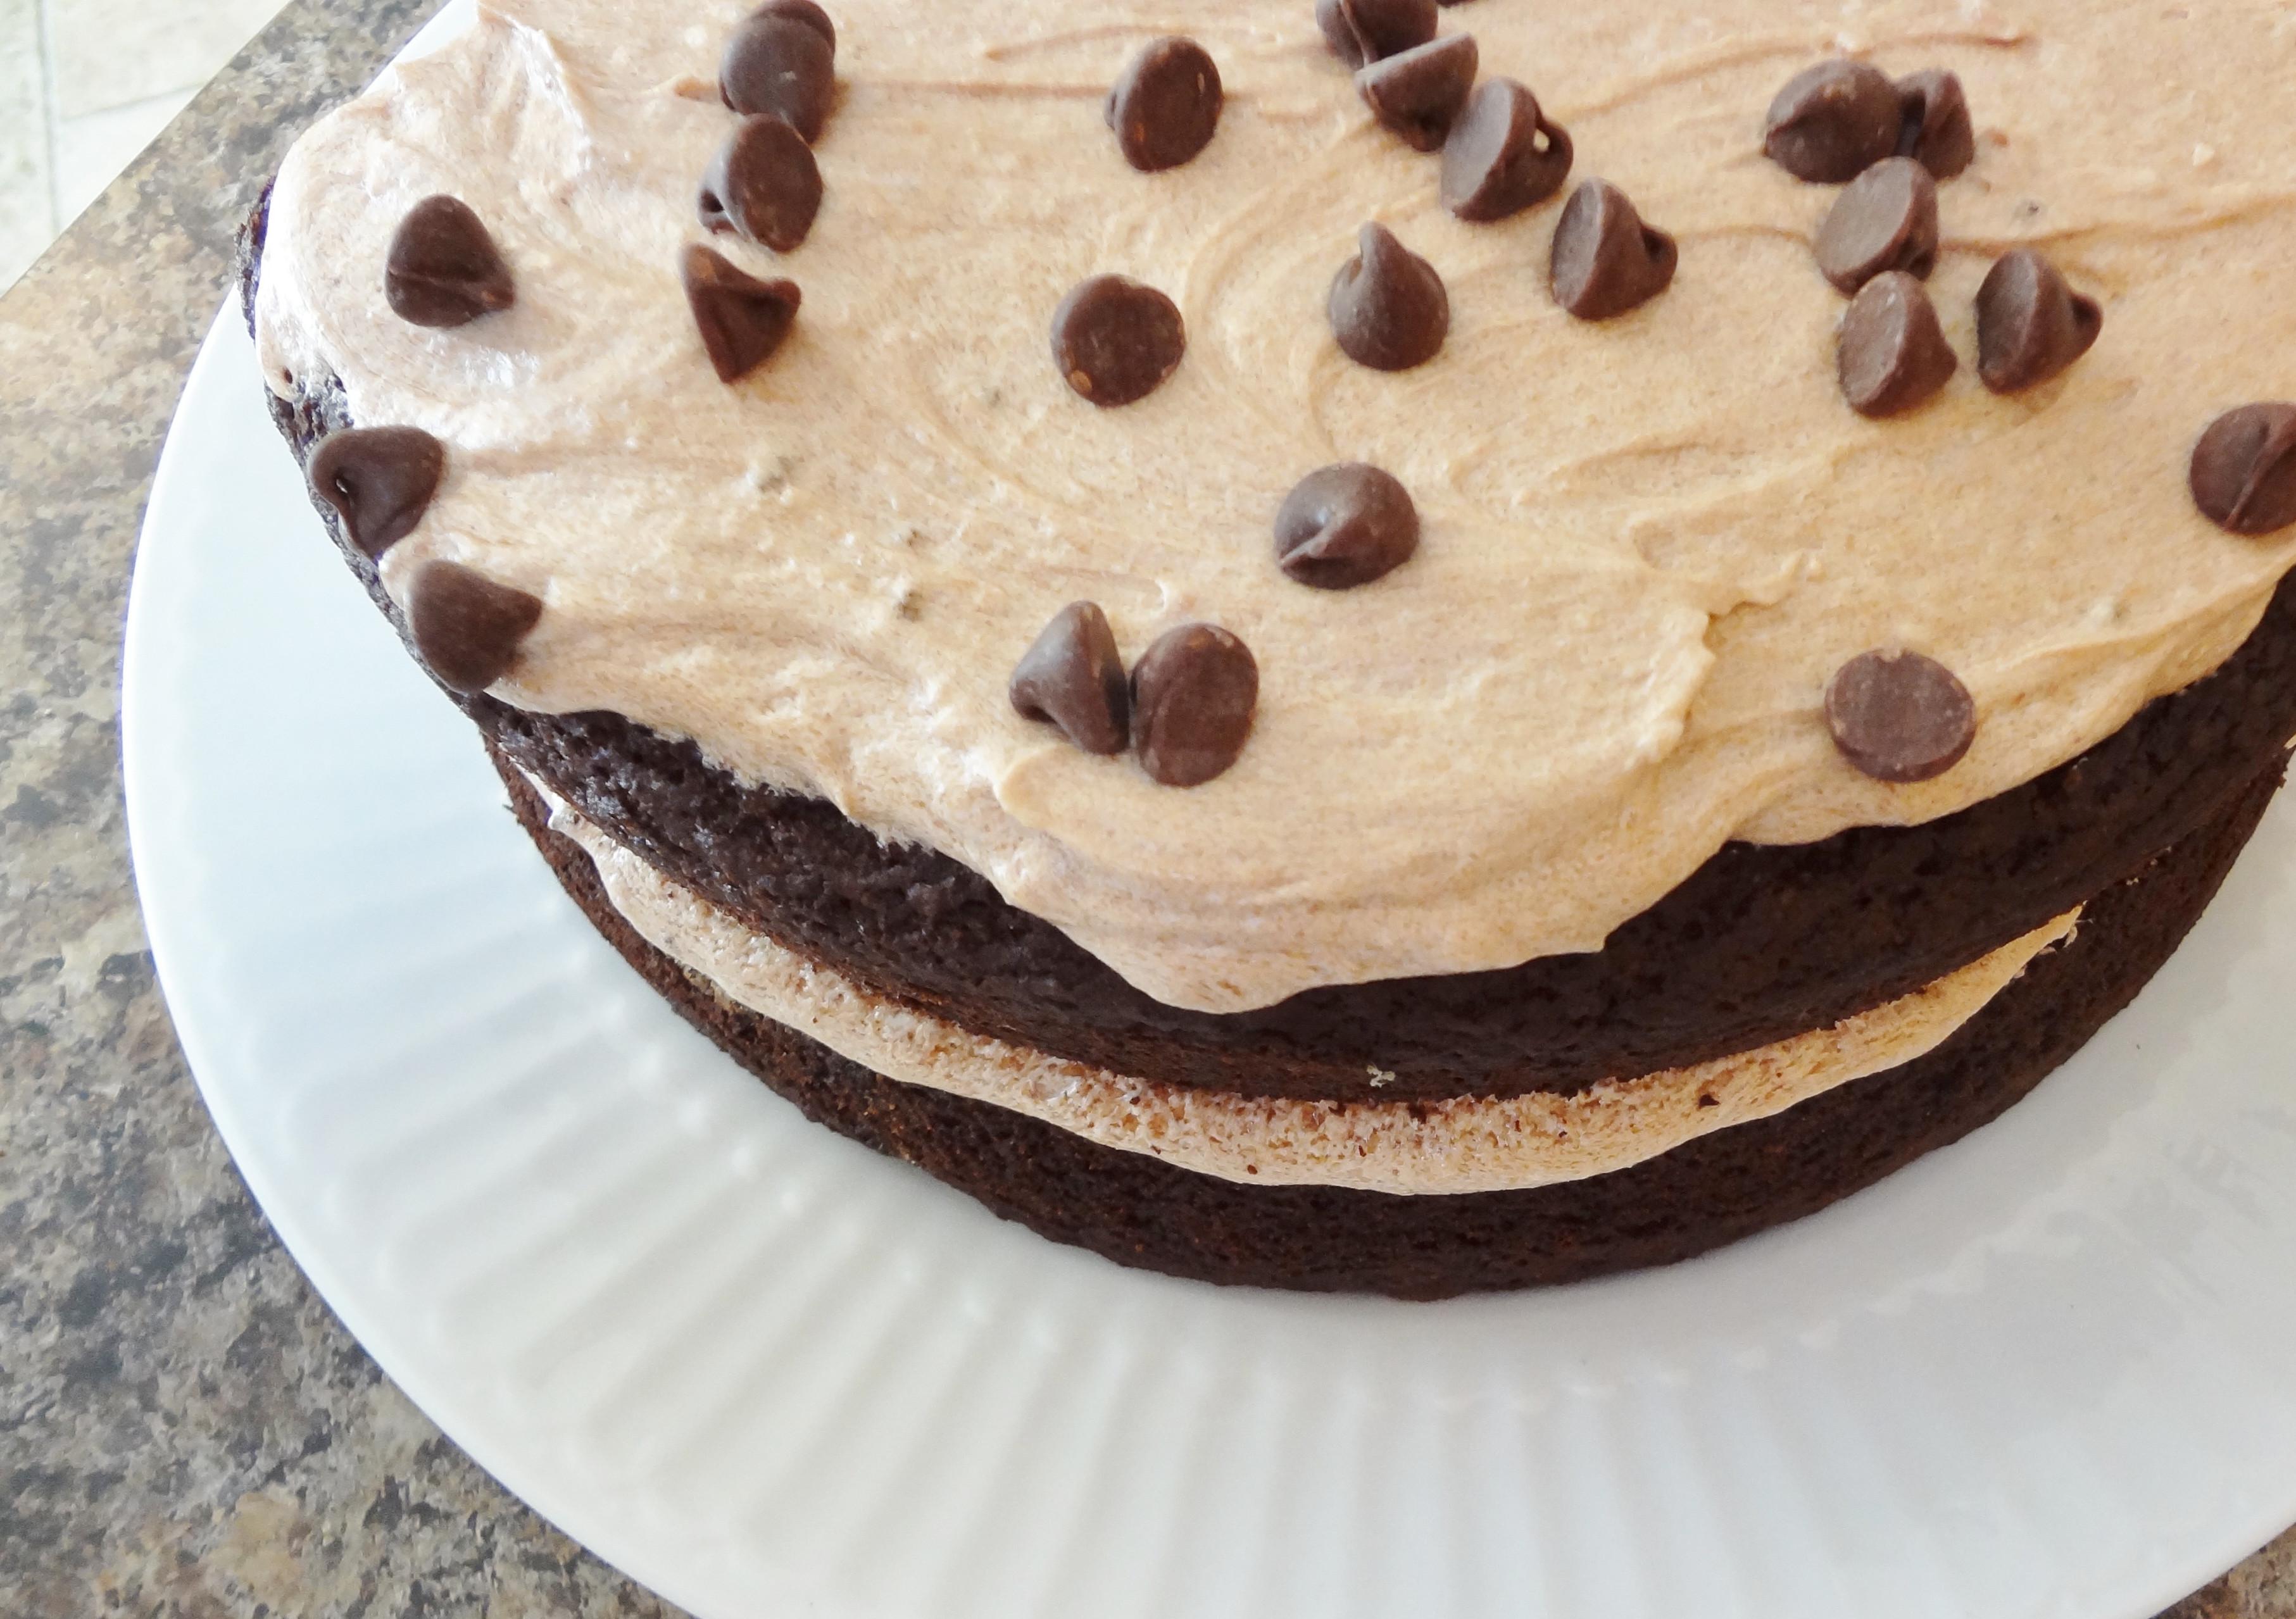 Chocolate Mocha Cake  Gluten Free Mocha Chocolate Cake with Mocha Frosting • The